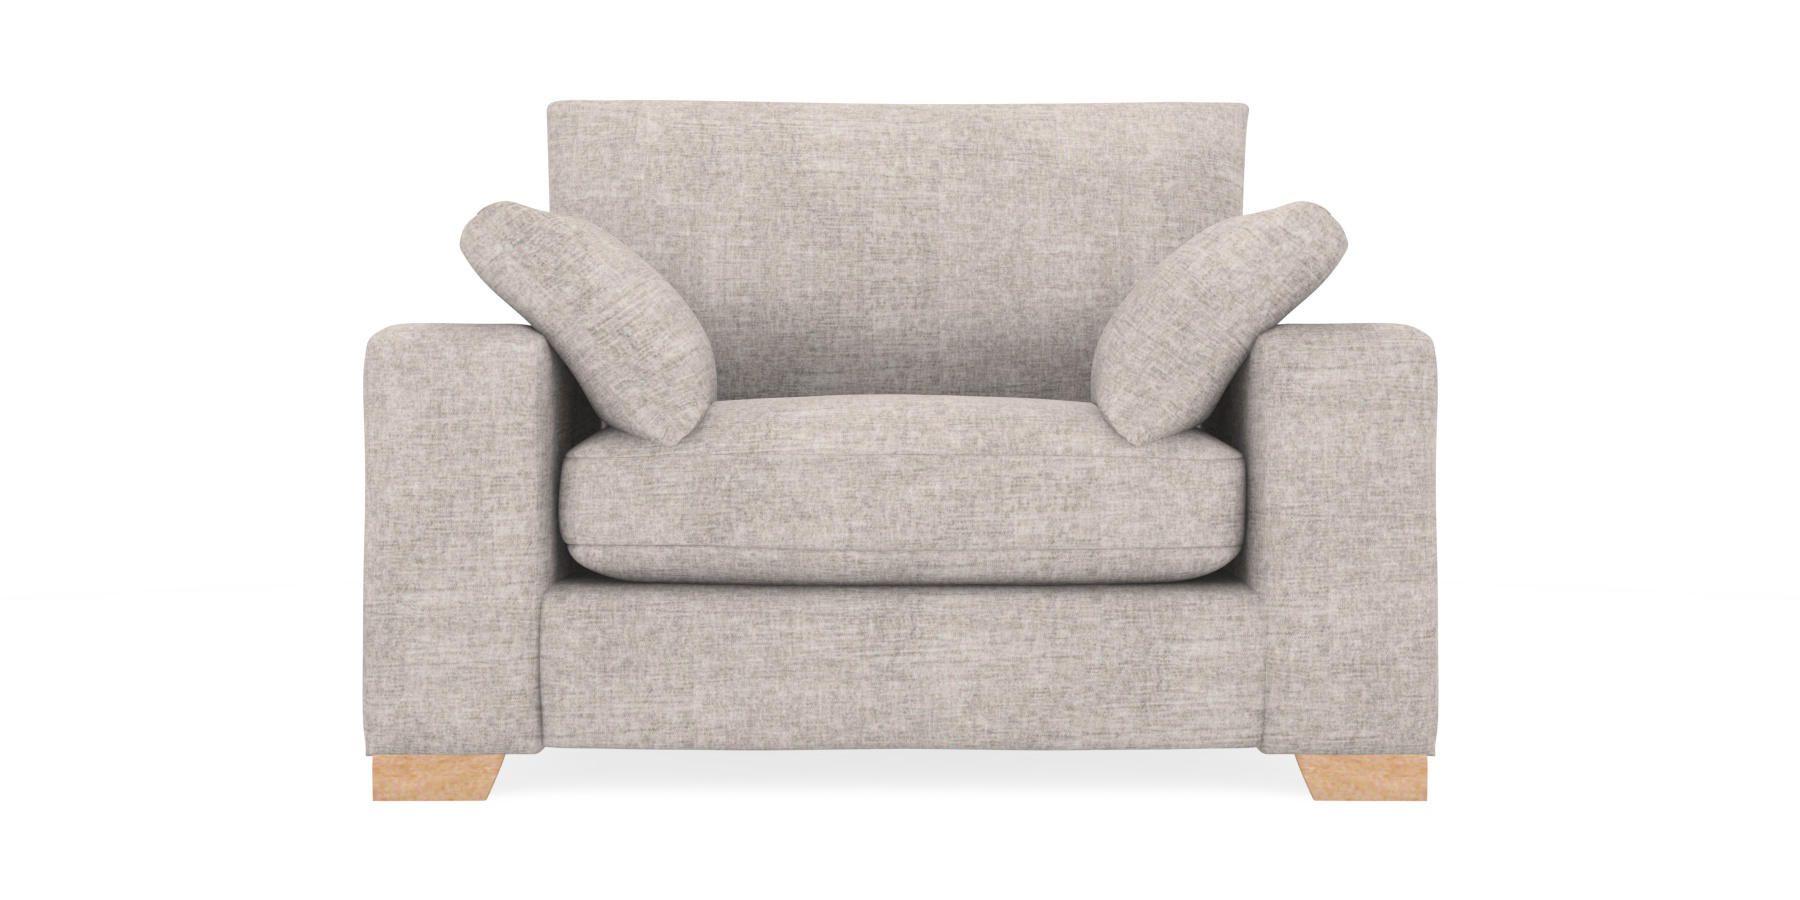 Buy Sonoma II Snuggle Seat (8 Seats) Sumptuous Velour Mid Silver